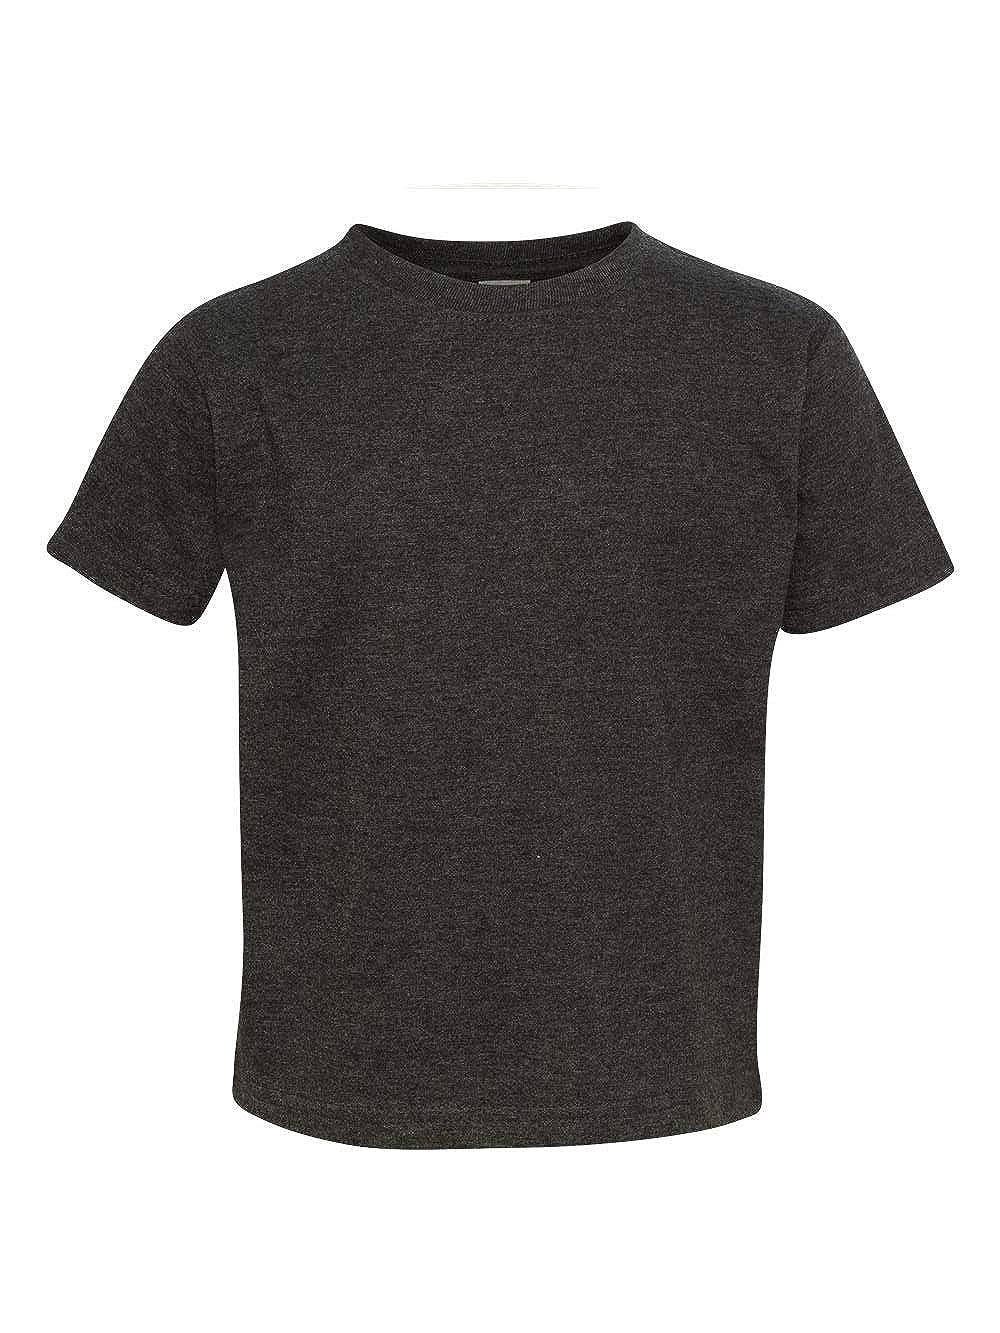 b5c1e21a6 Amazon.com: Rabbit Skins Toddler Vintage Ringspun Jersey T-Shirt: Clothing